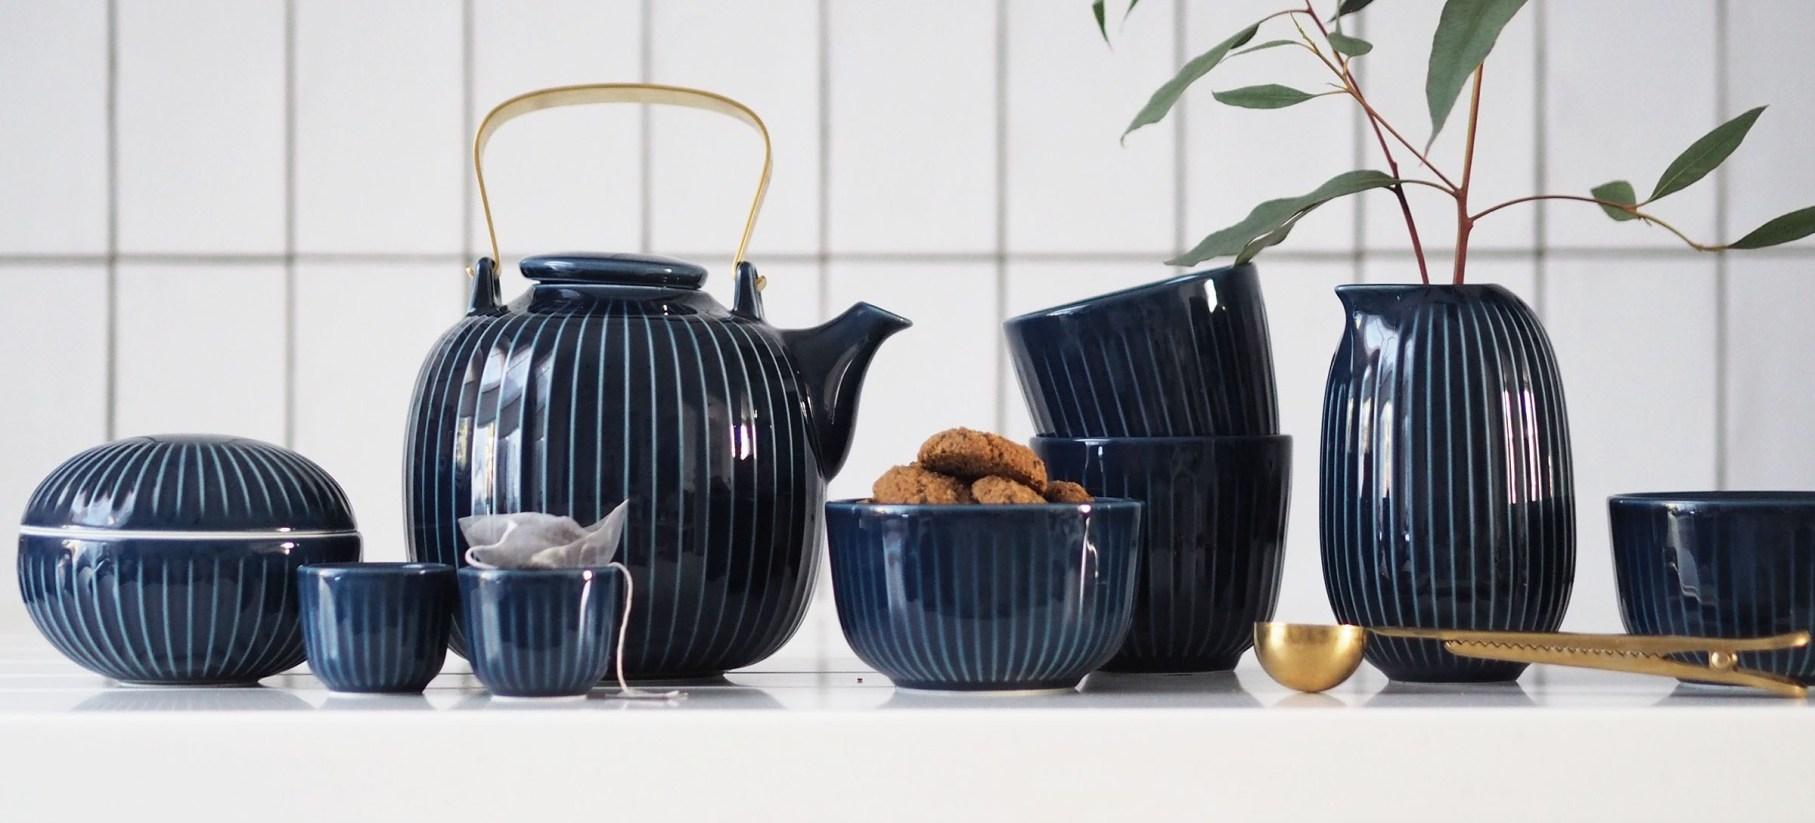 catesthill-kahler-hammershoi-indigo-tea-tableware-15.jpg